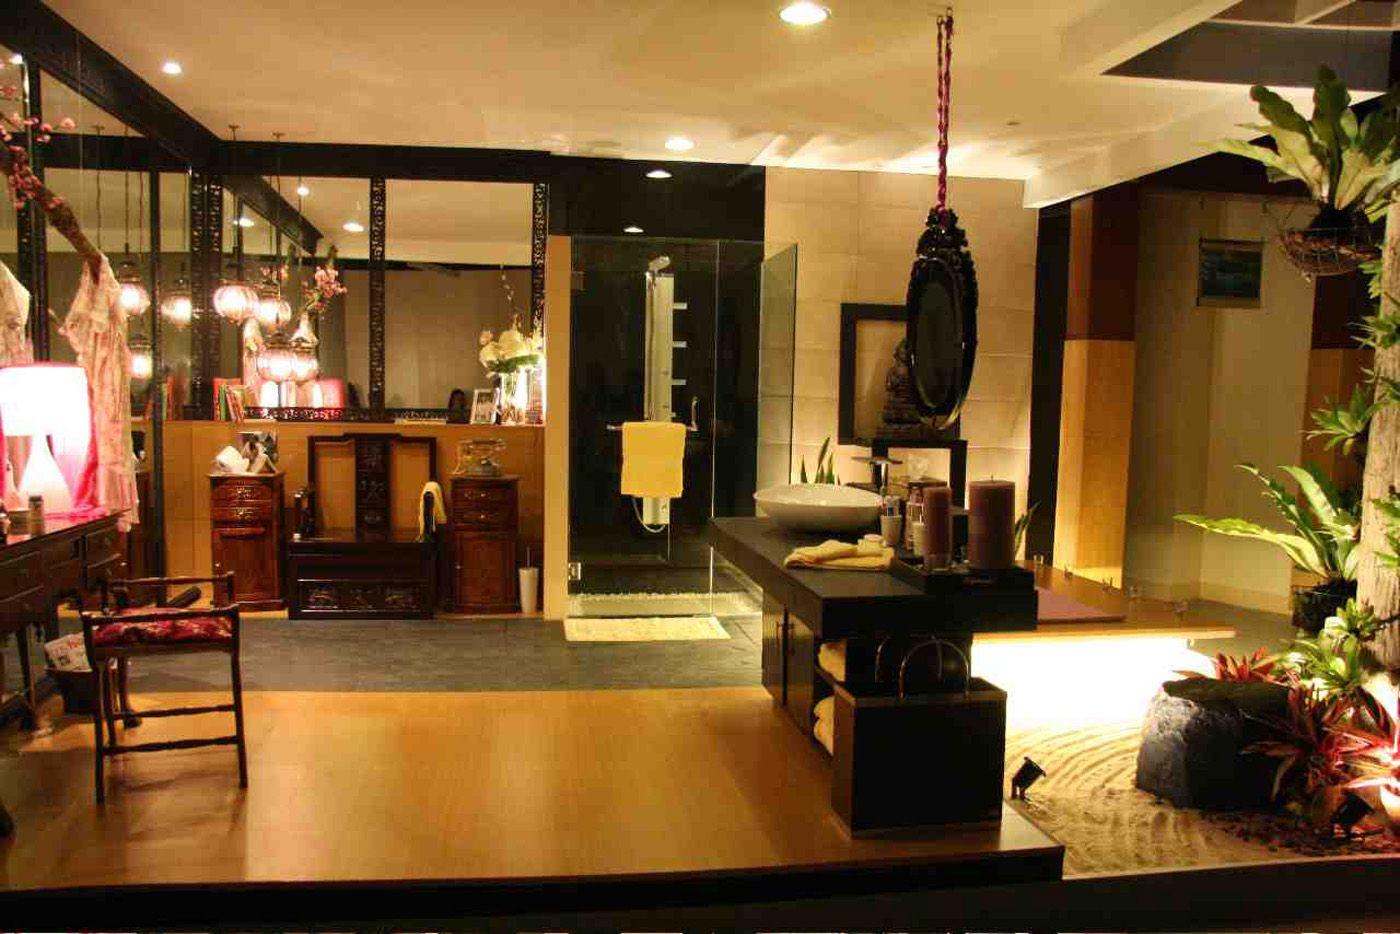 Serene Asian Interior Design For Peaceful And Elegant Urban Living | Ideas  4 Homes